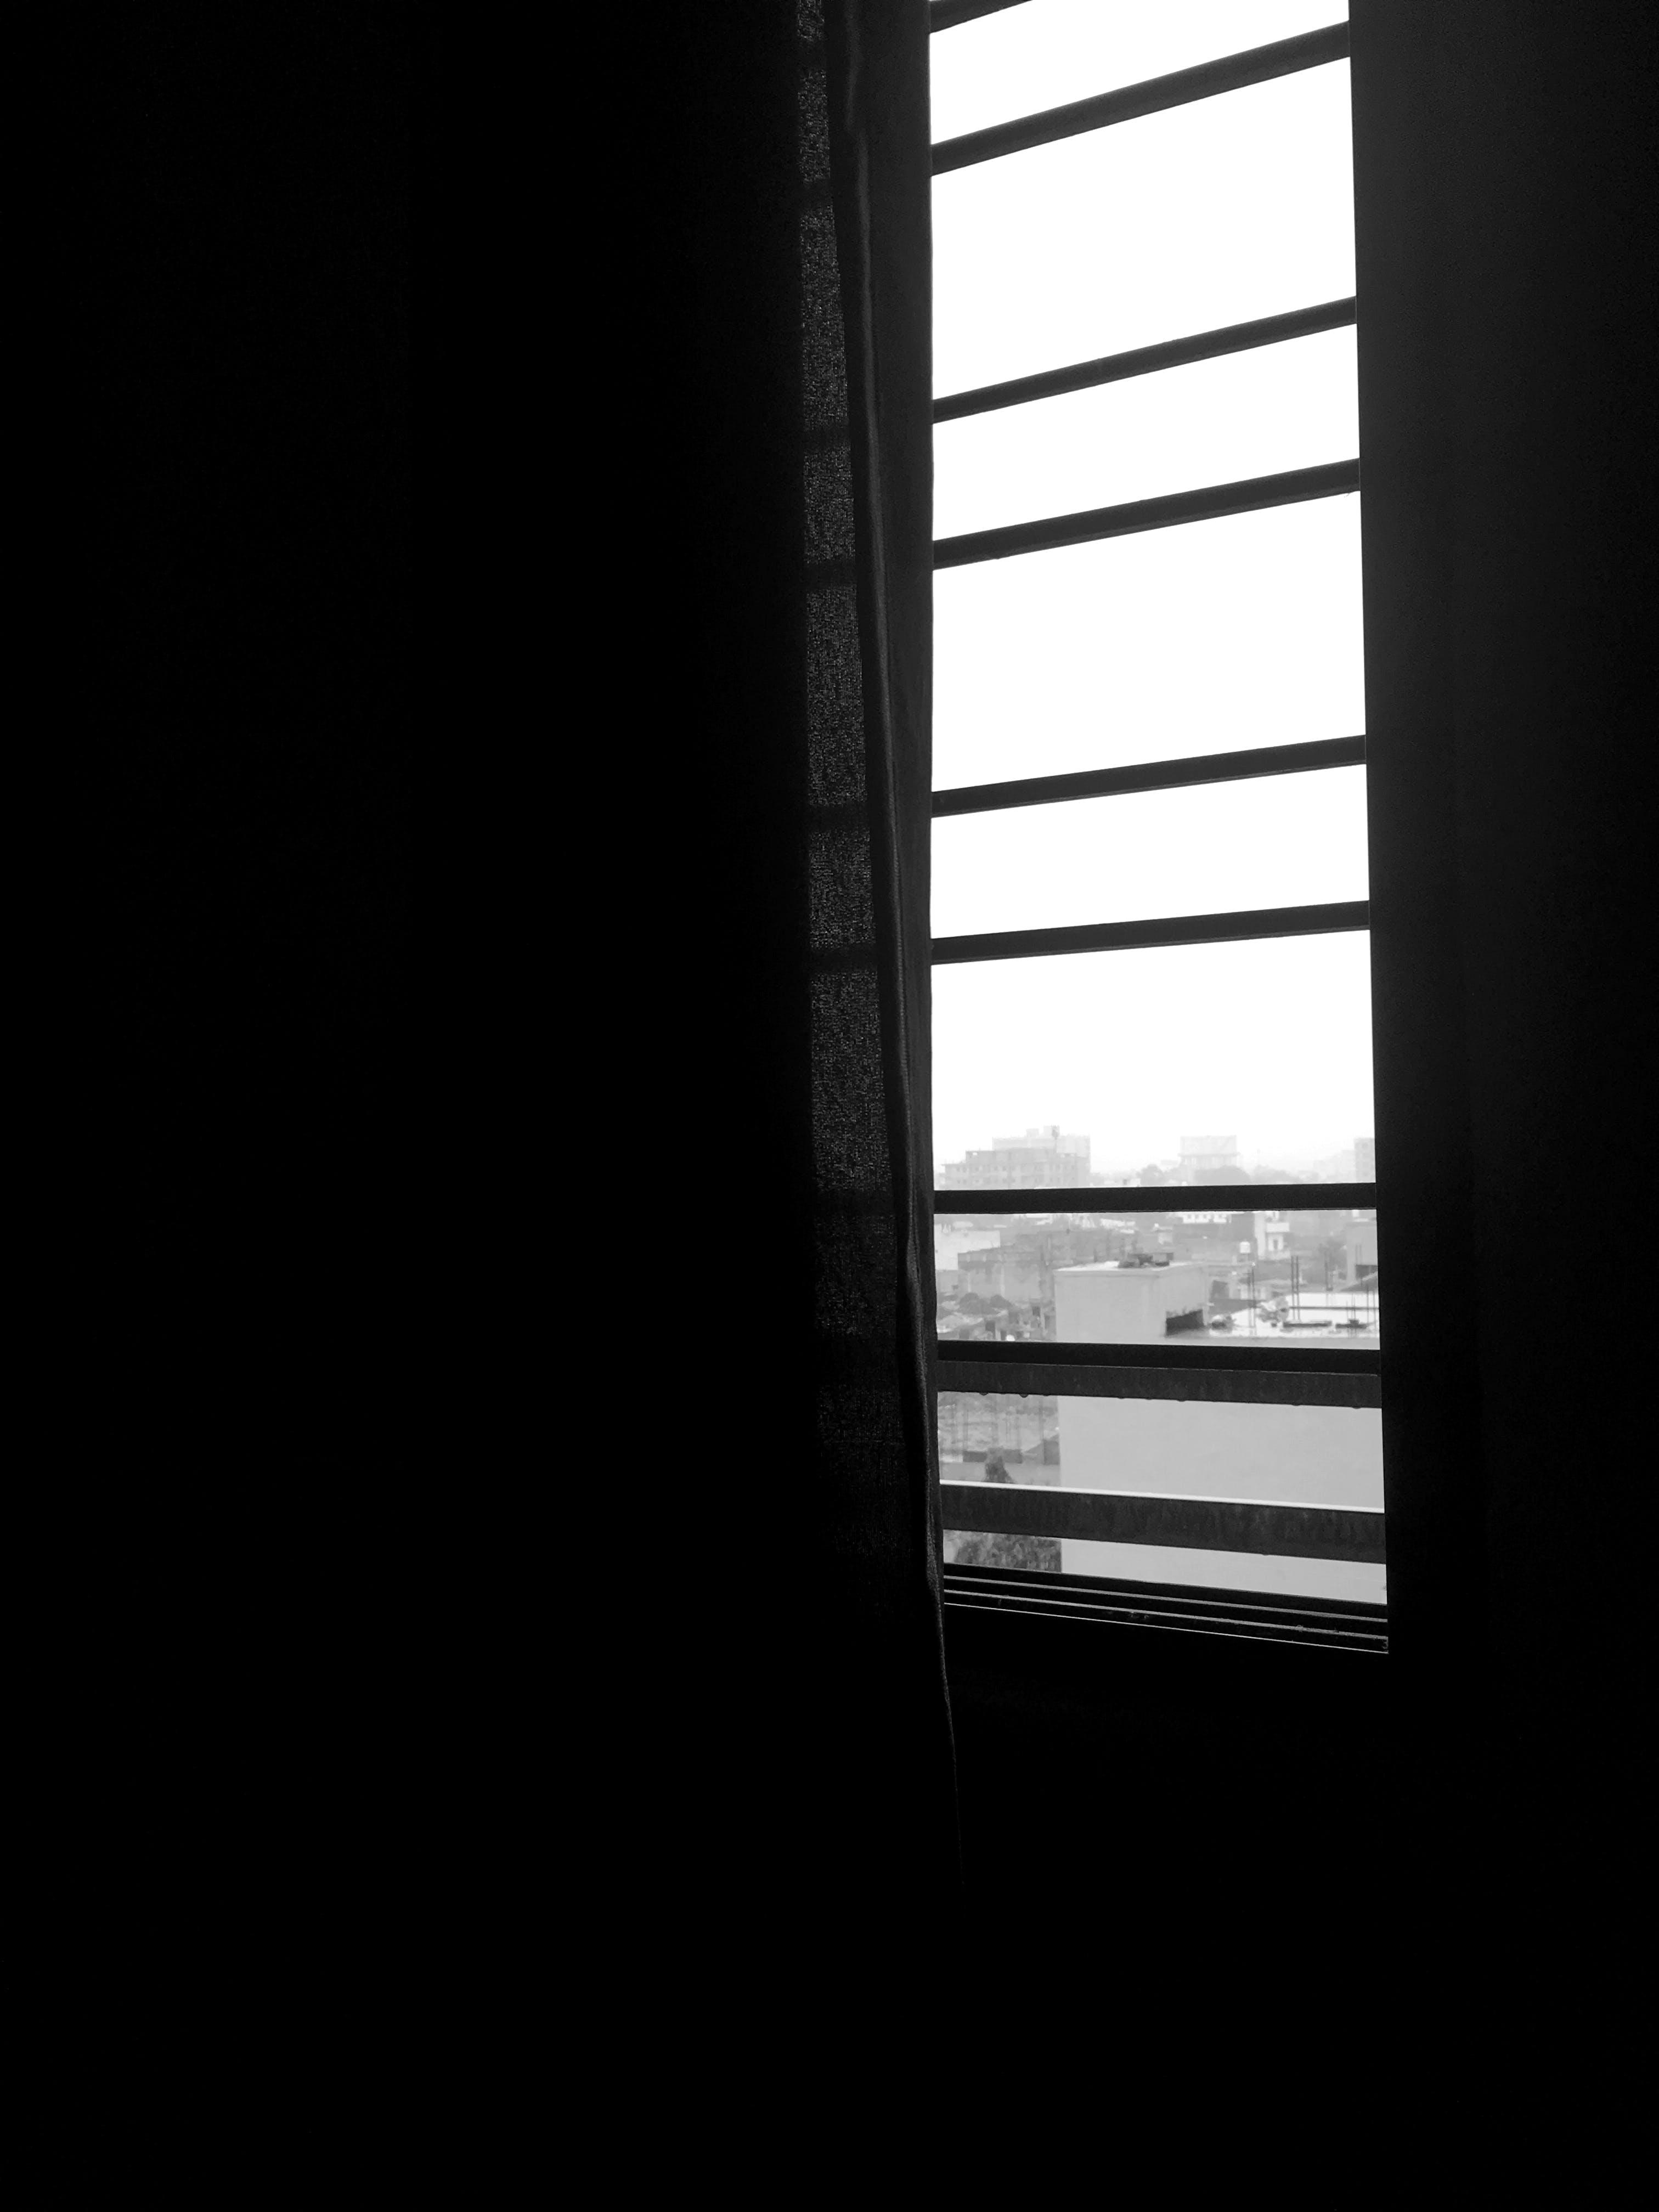 Free stock photo of black and white, cold, gloom, gloomy